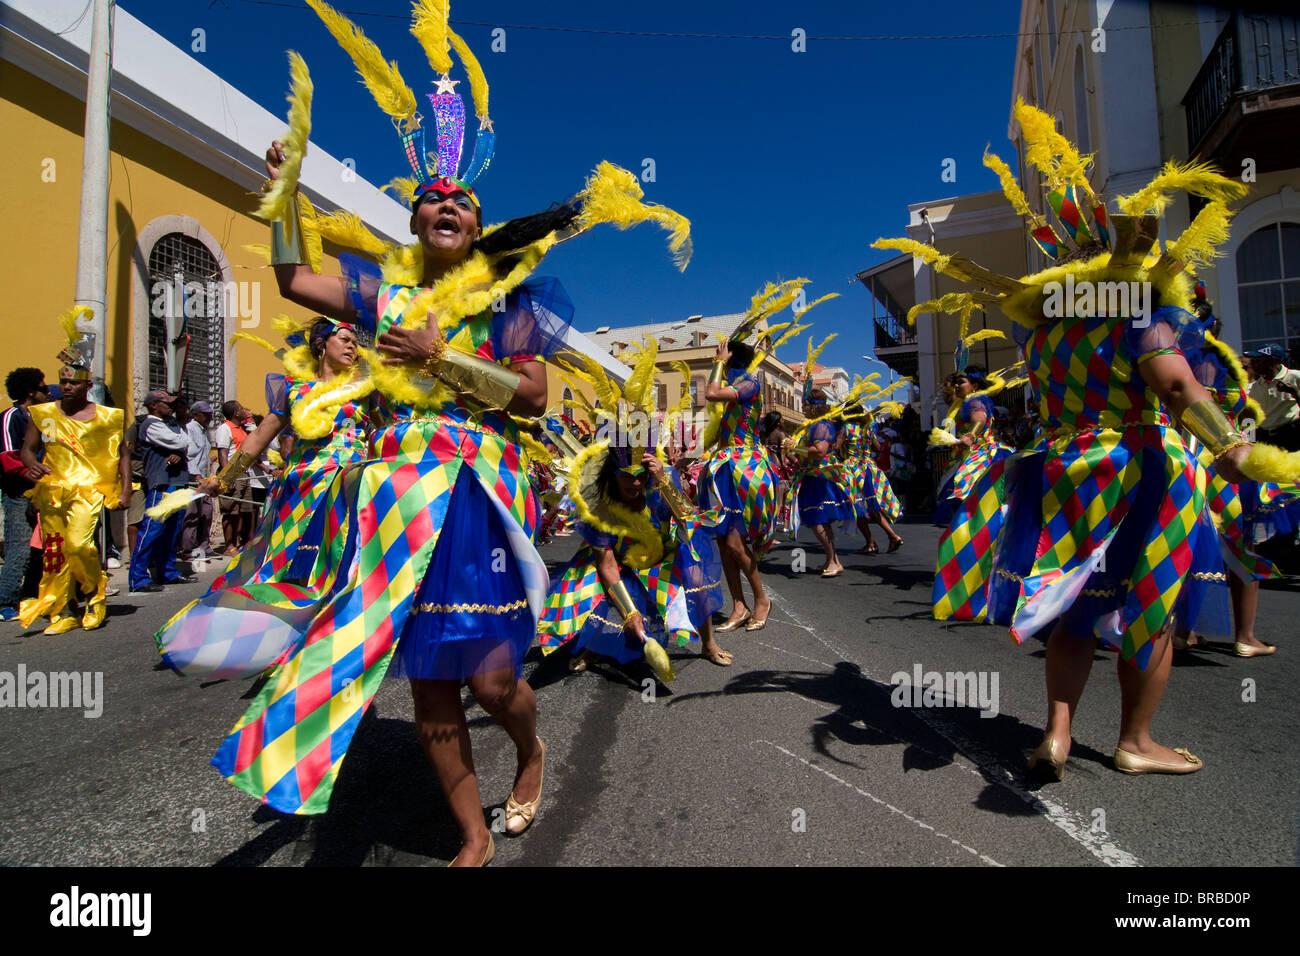 Kostümierte Frauen tanzen, Karneval, Mindelo, Sao Vicente, Kap Verde Stockfoto